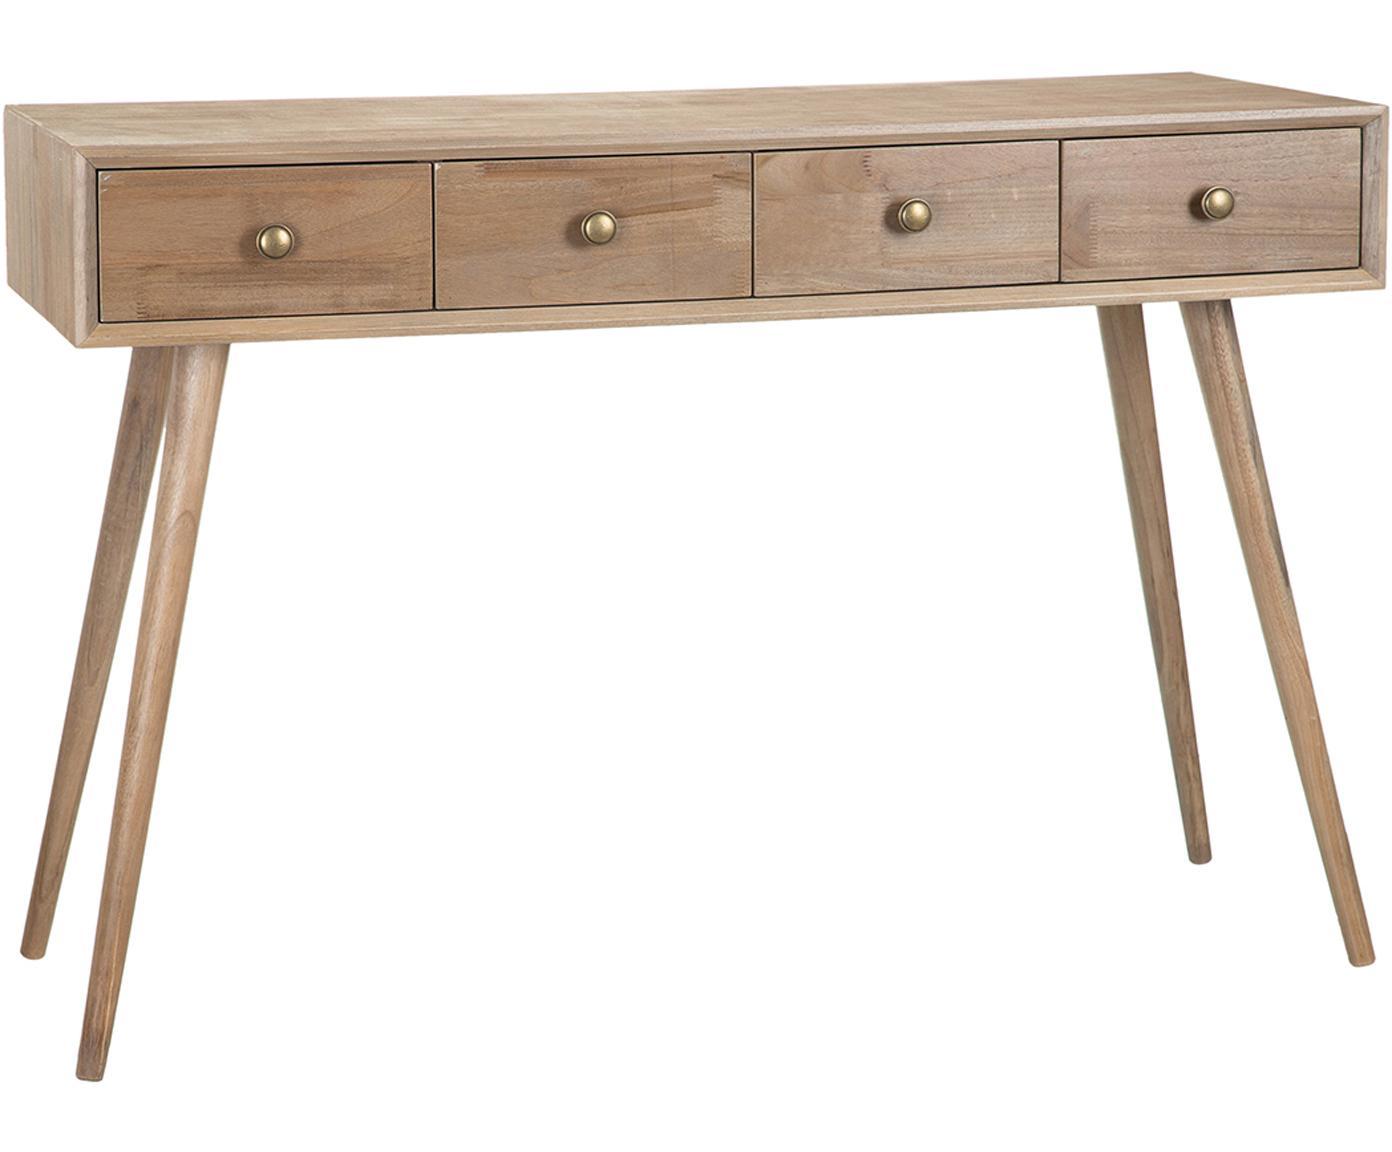 Consola Marni, Patas: madera de alcanfor, Tablero: tablero de fibras de dens, Madera, An 110 x Al 78 cm